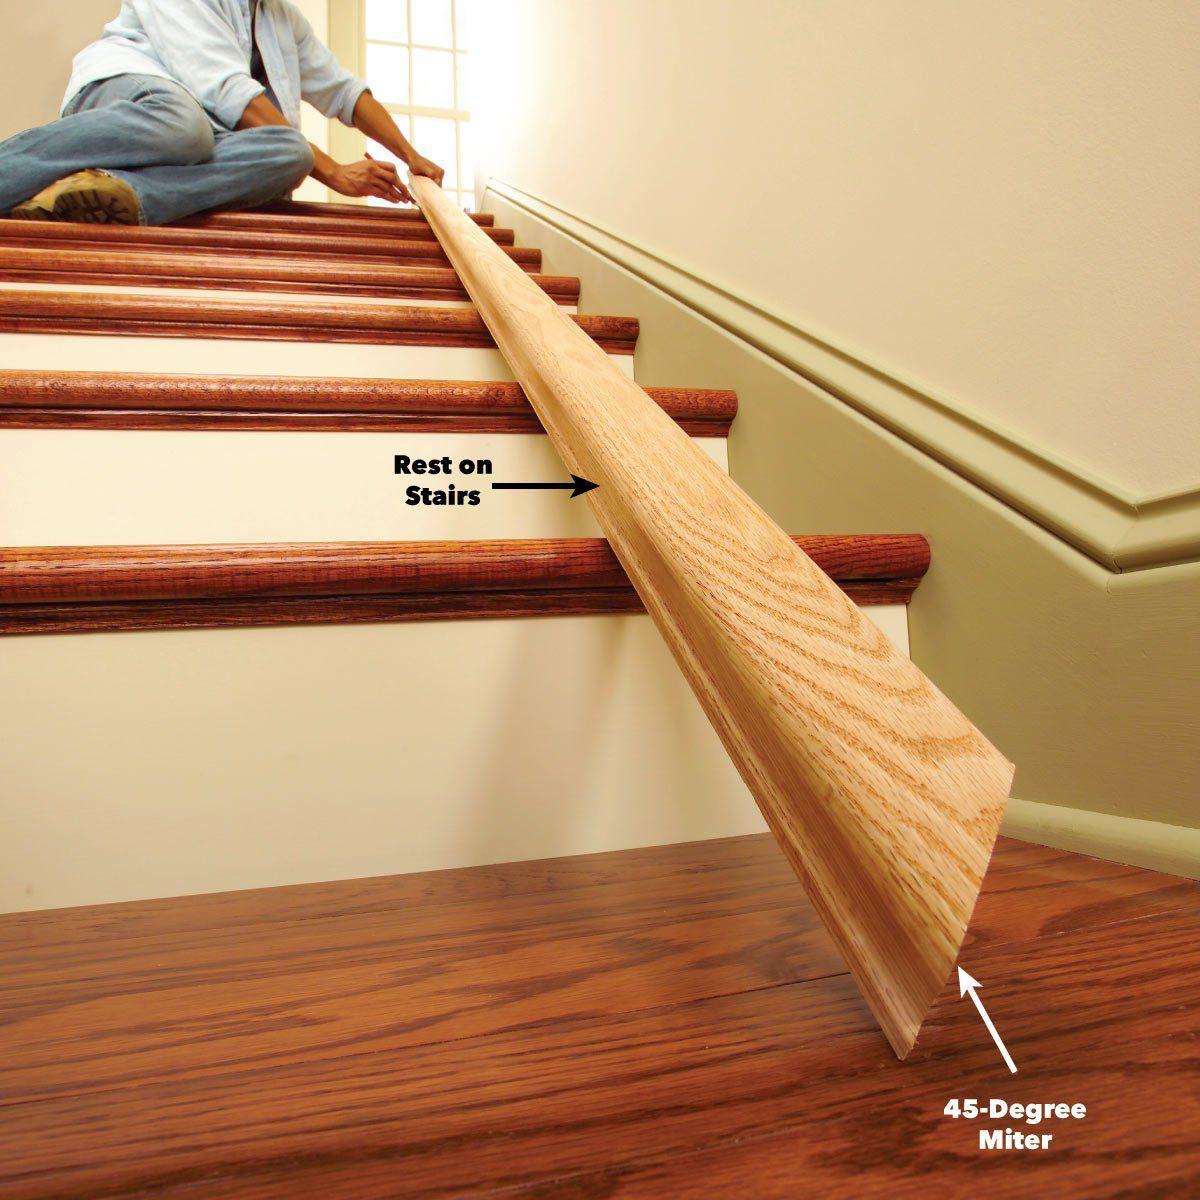 Install a New Stair Handrail | Stair handrail, Interior ...